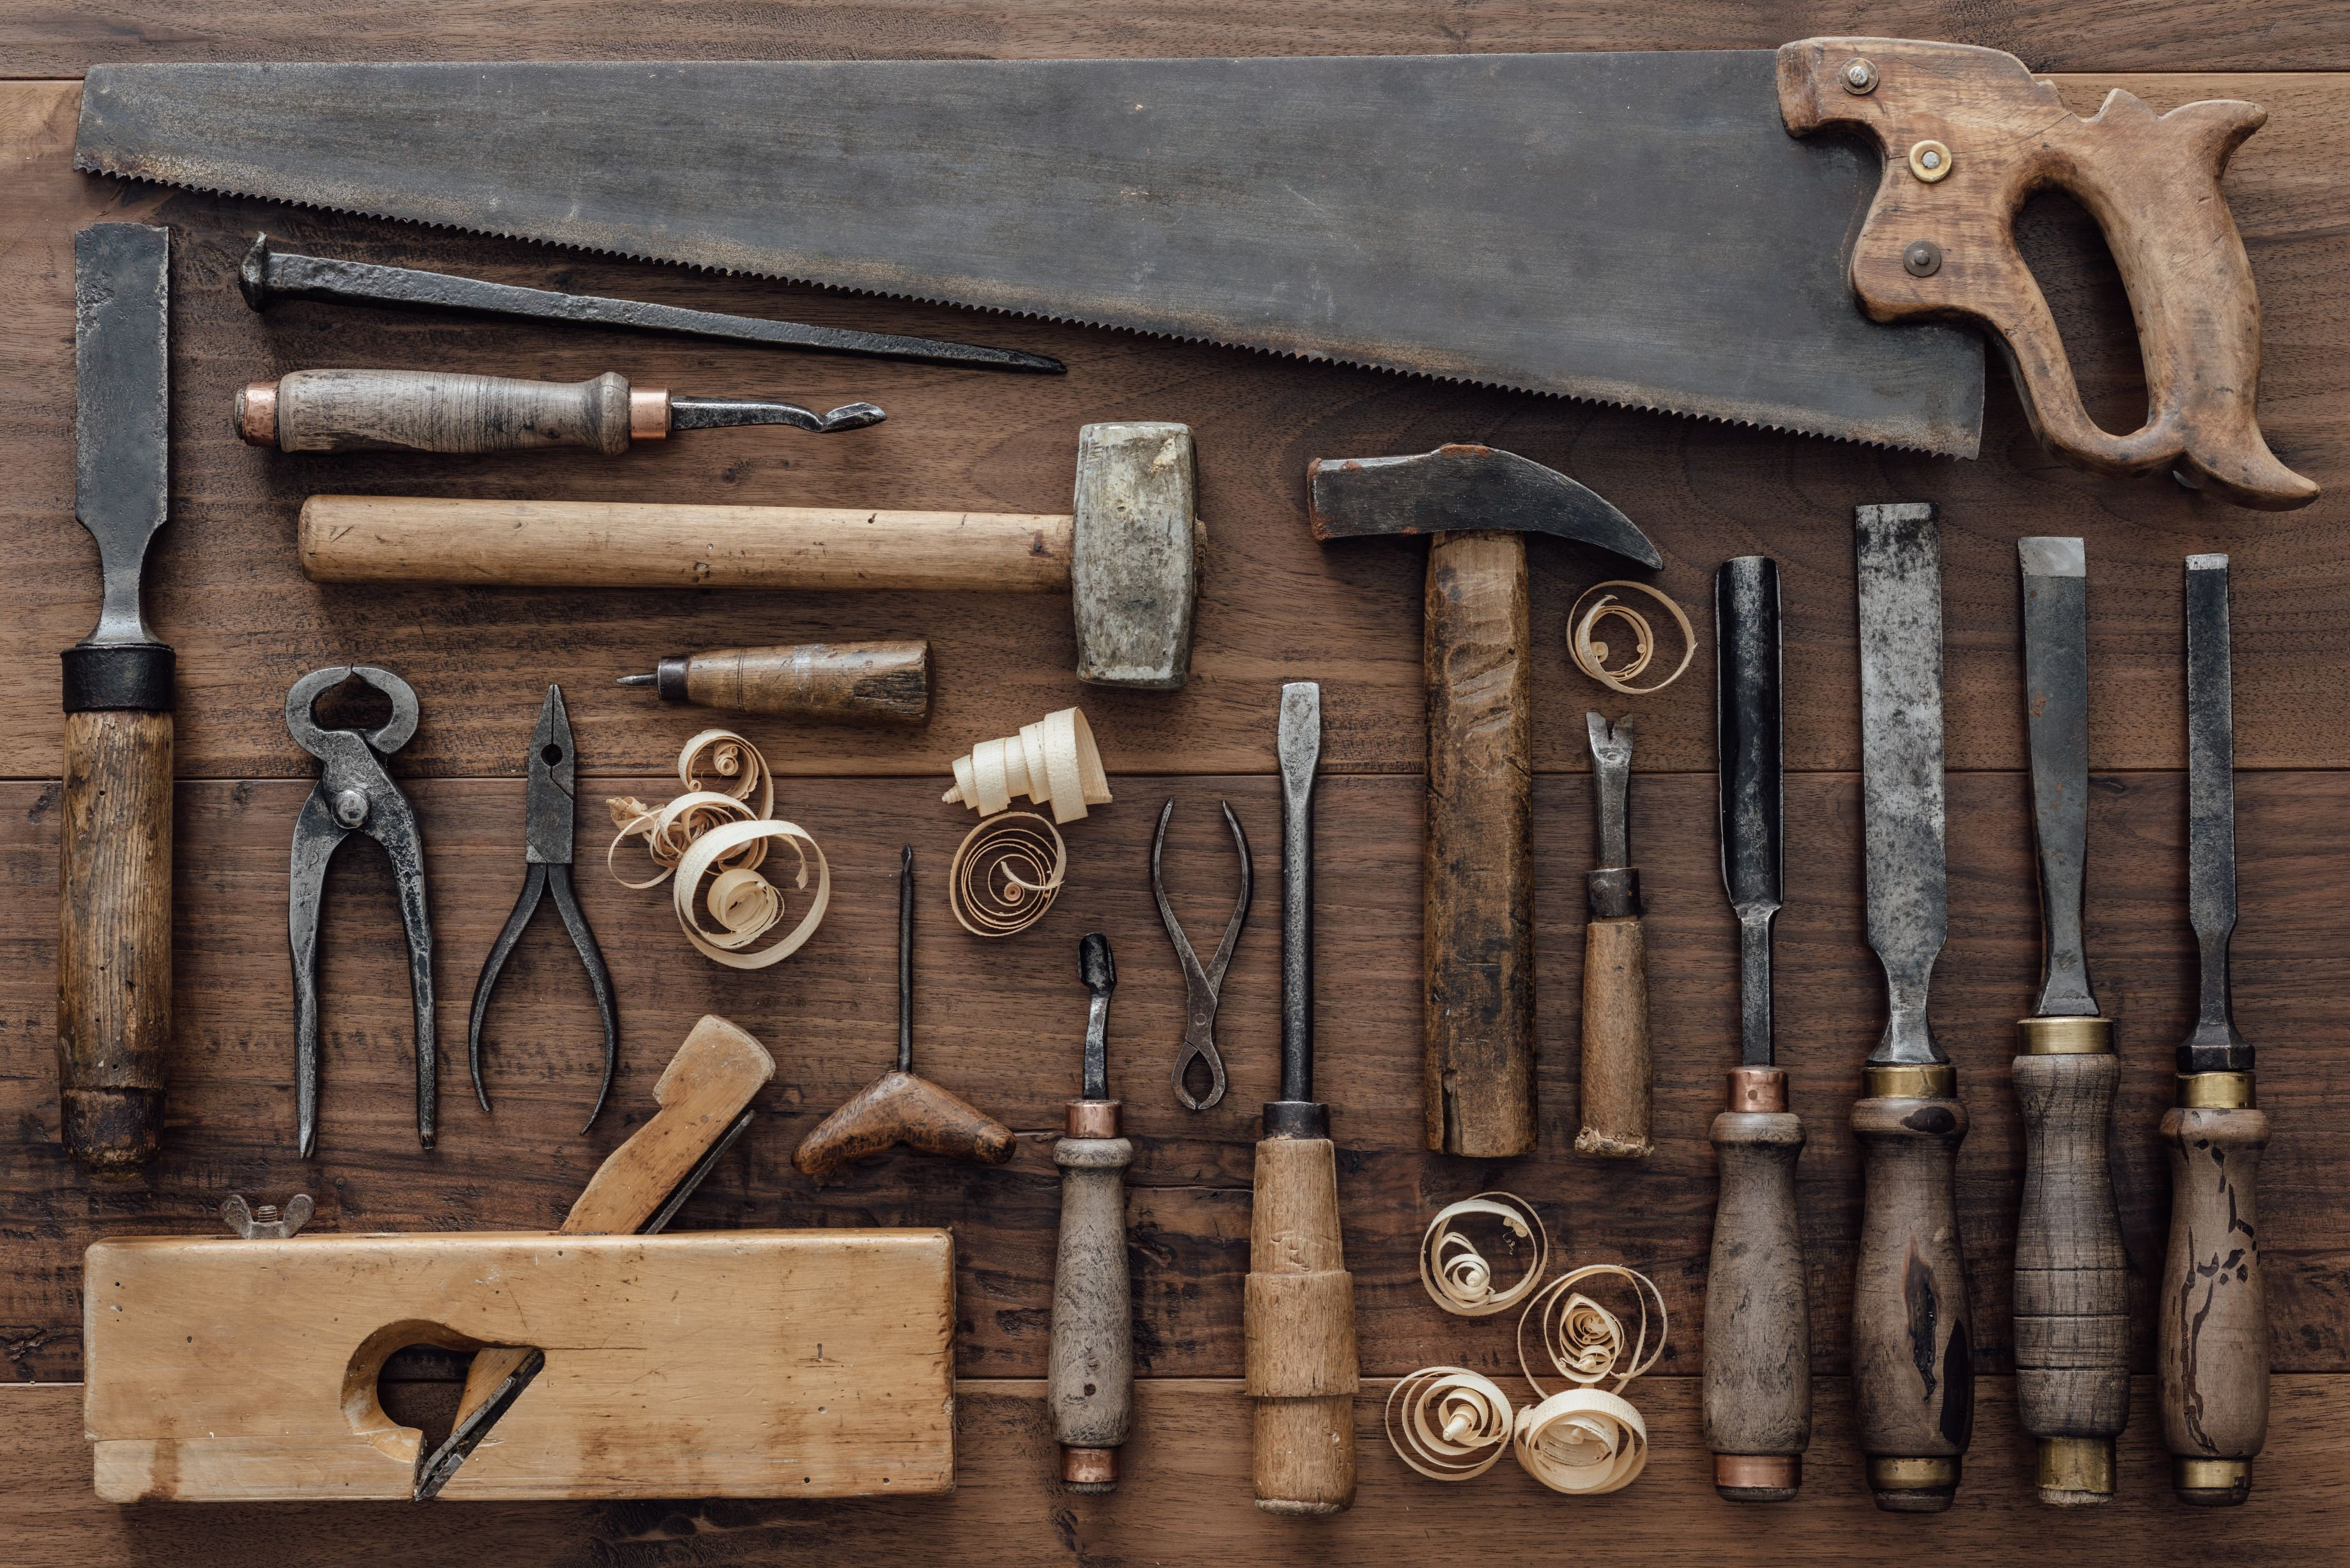 Woodworking Equipment & Supplies